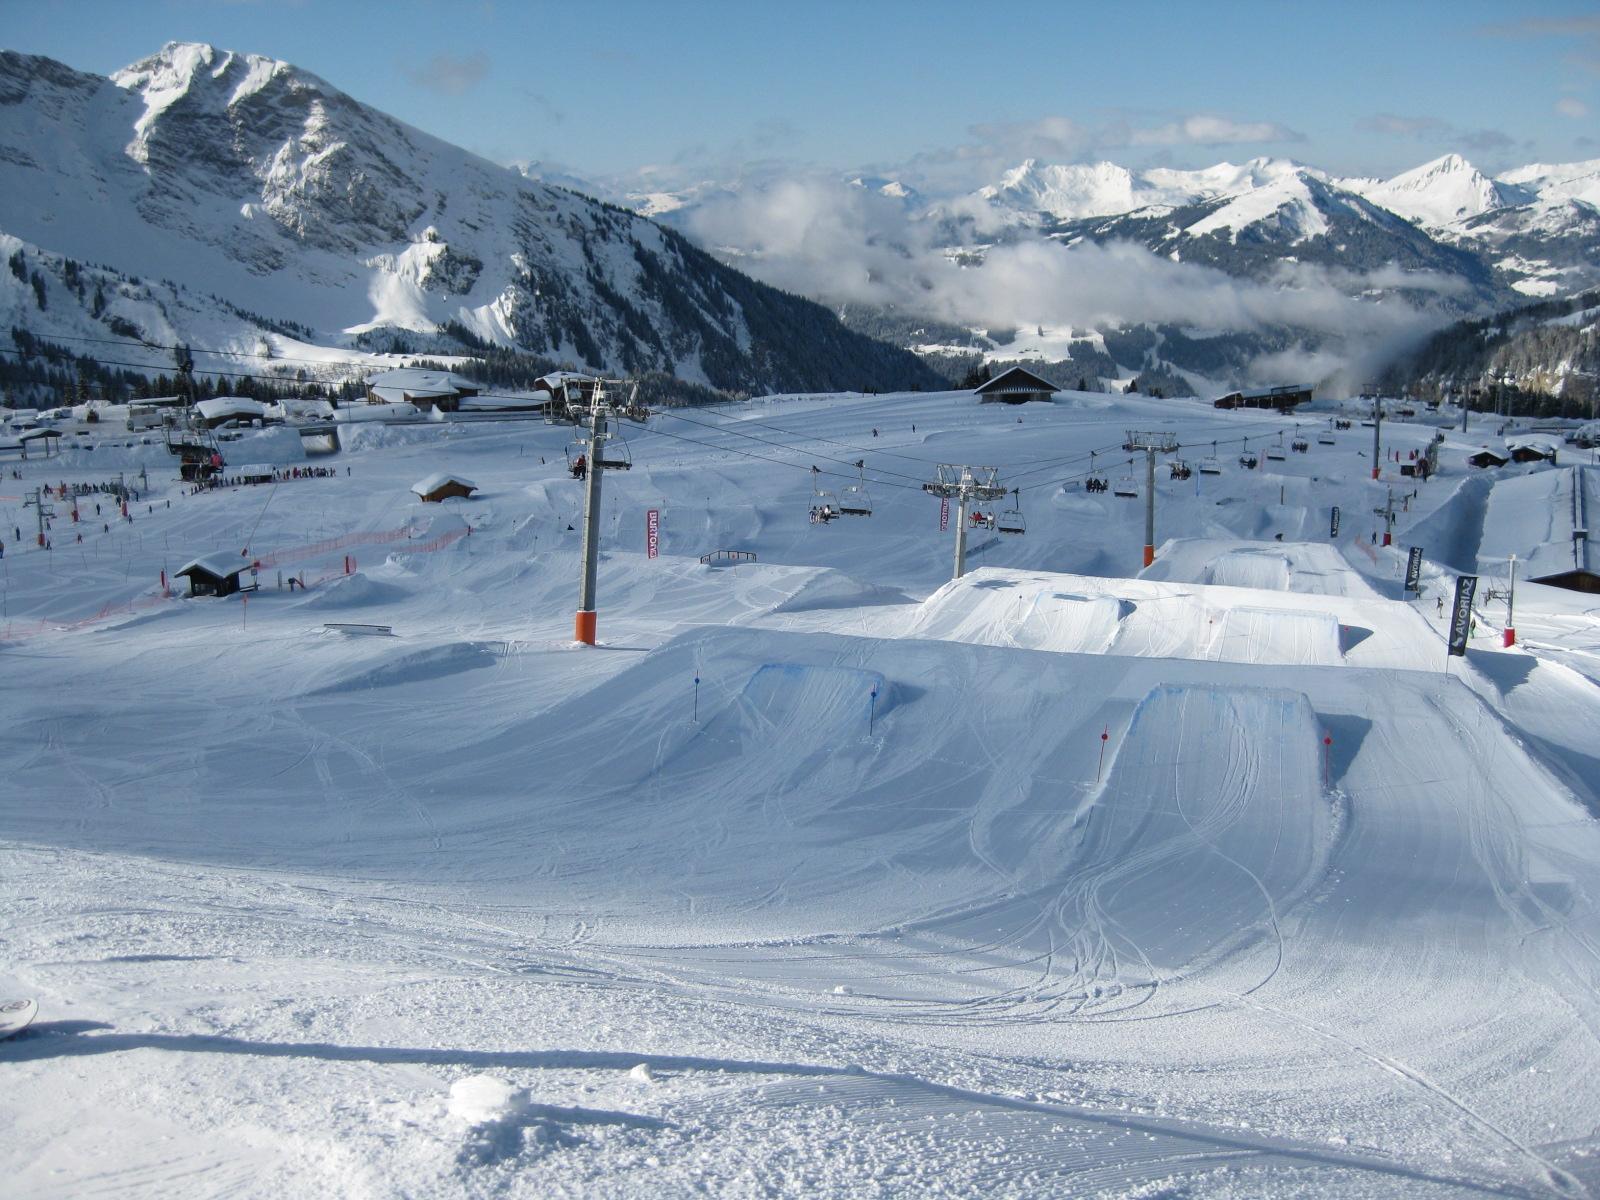 Station de ski, Avoriaz